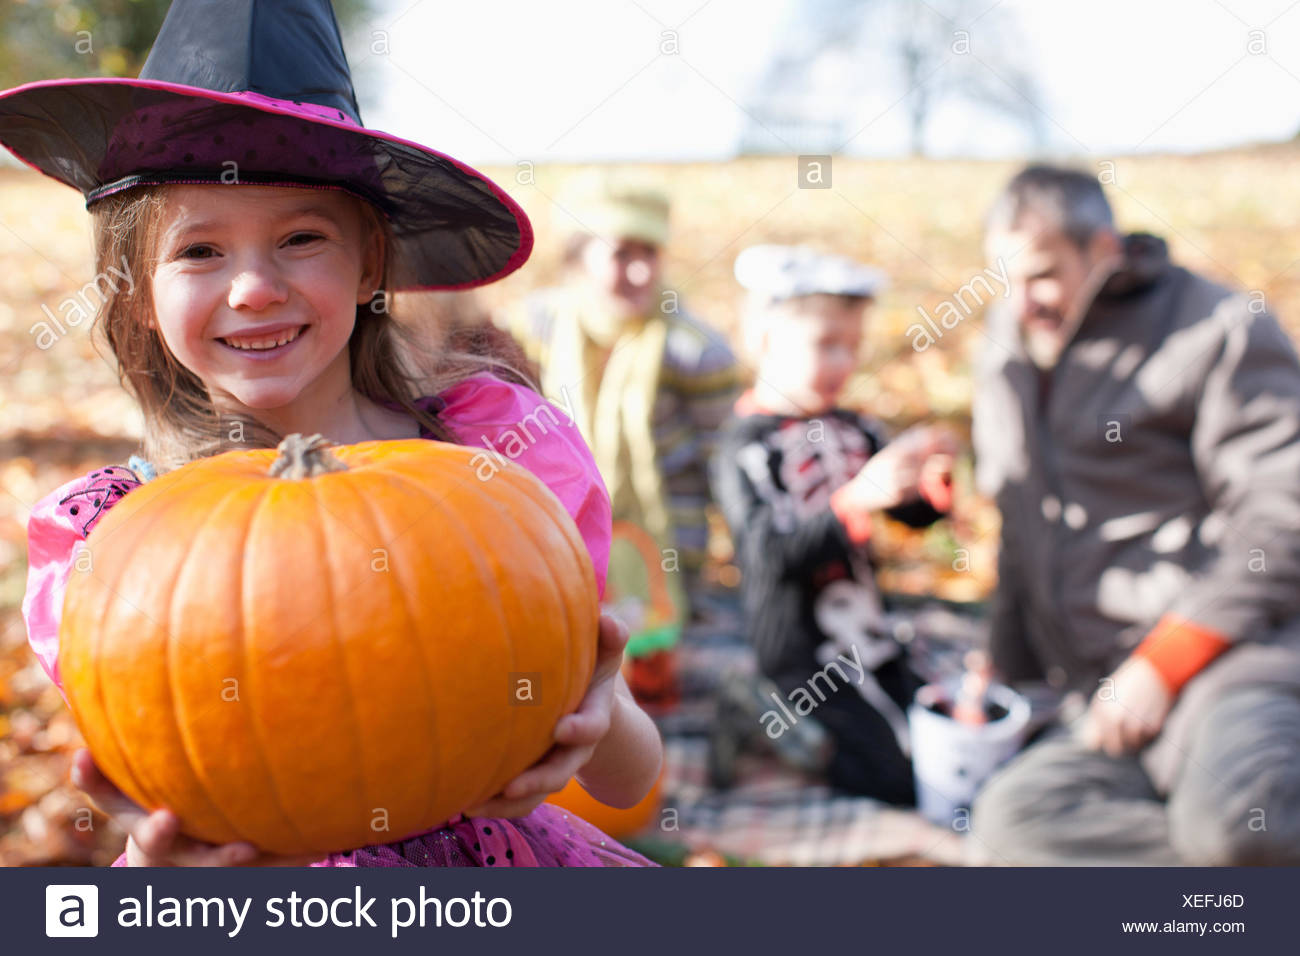 Girl in Halloween costumes holding pumpkin - Stock Image